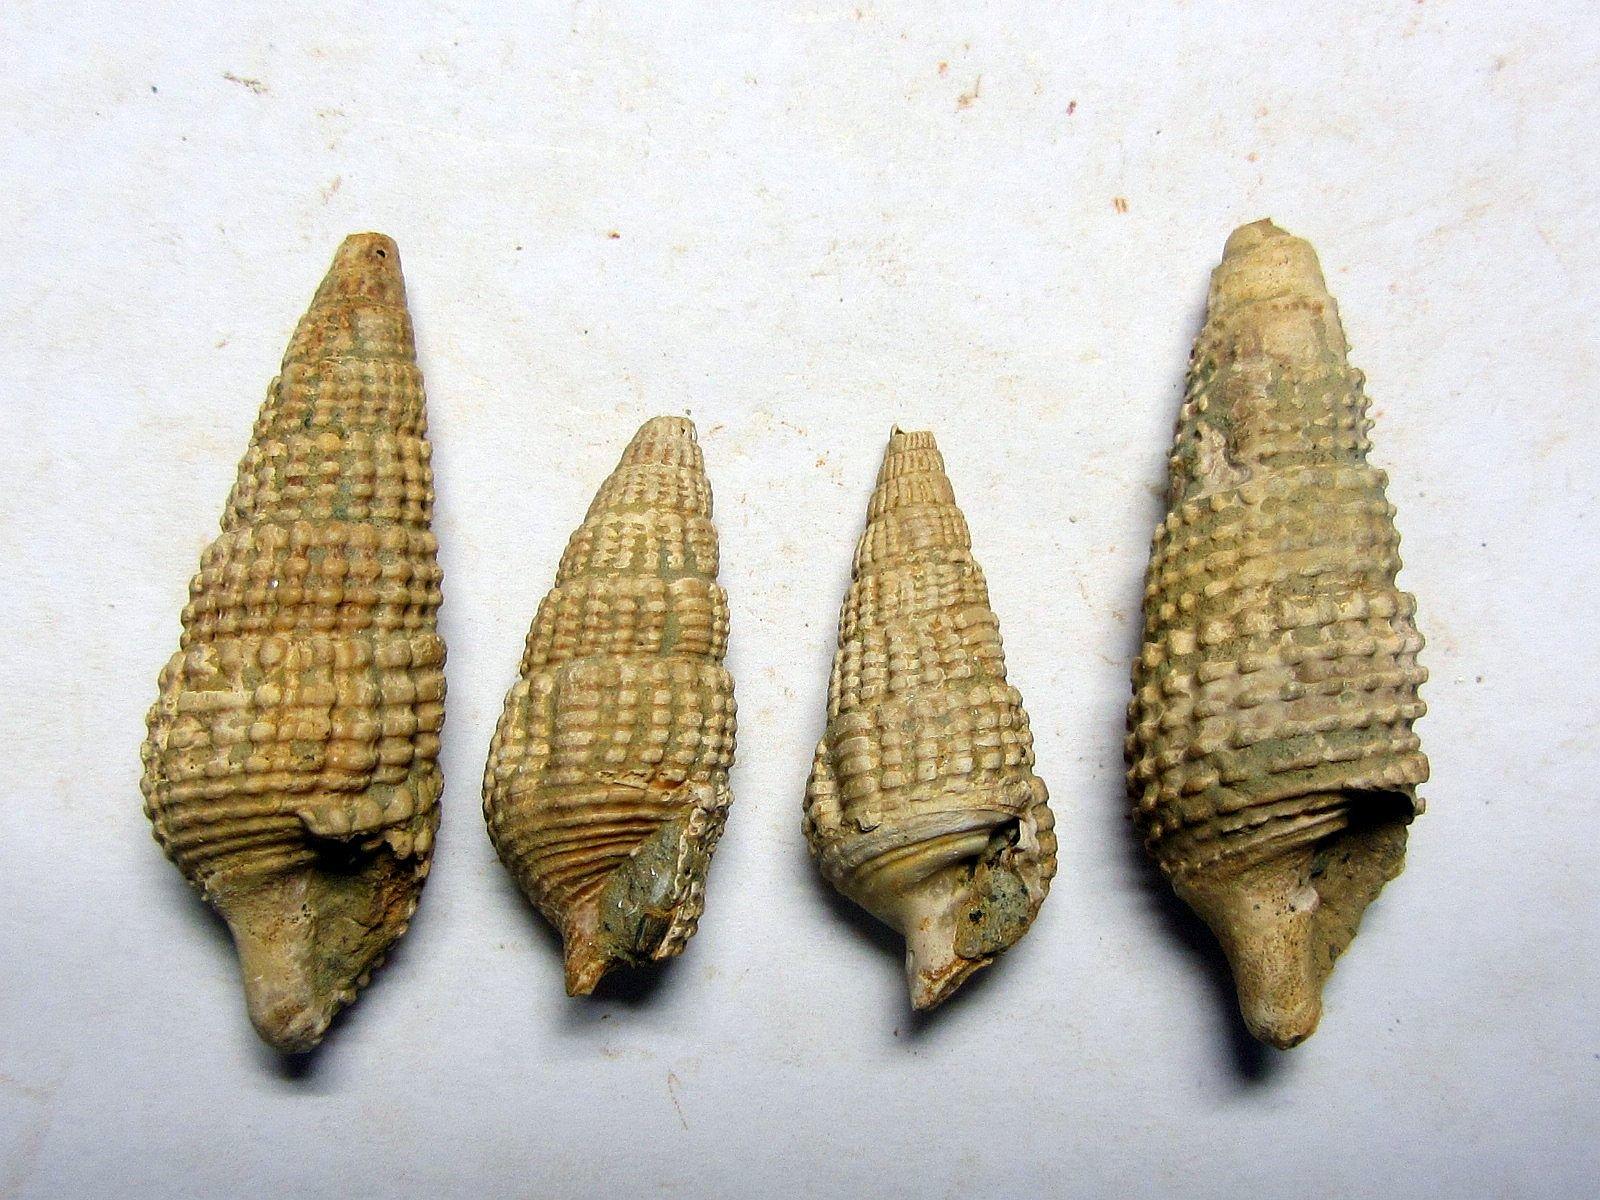 Terebralia duboisi (Hoernes 1855)